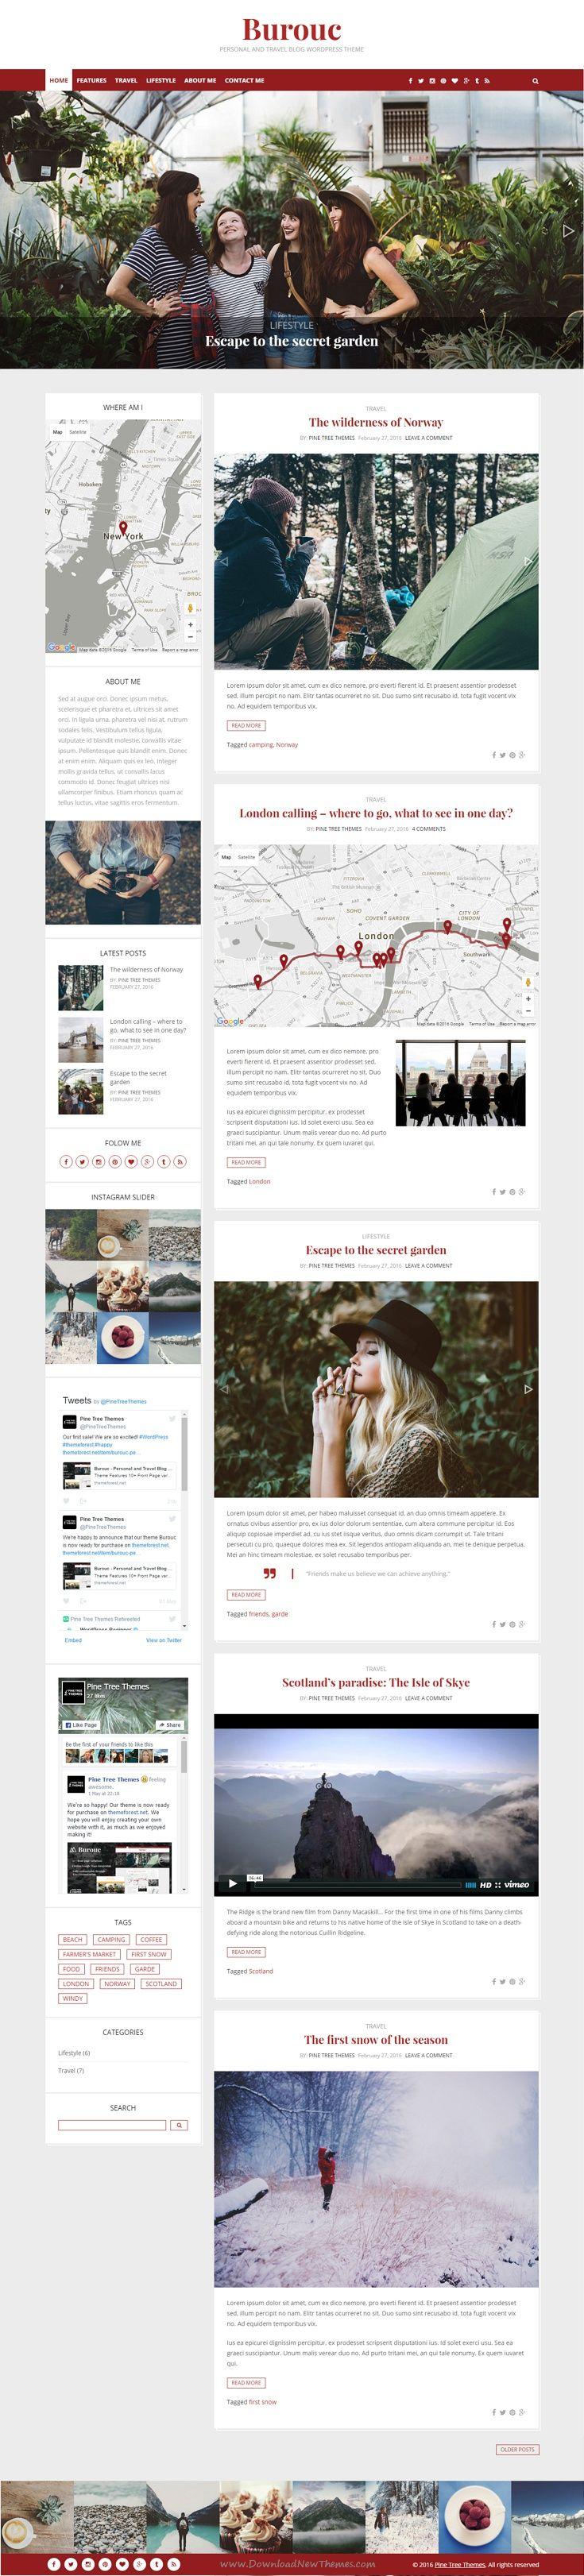 Burouc Responsive Personal and Travel #Blog #WordPress Theme